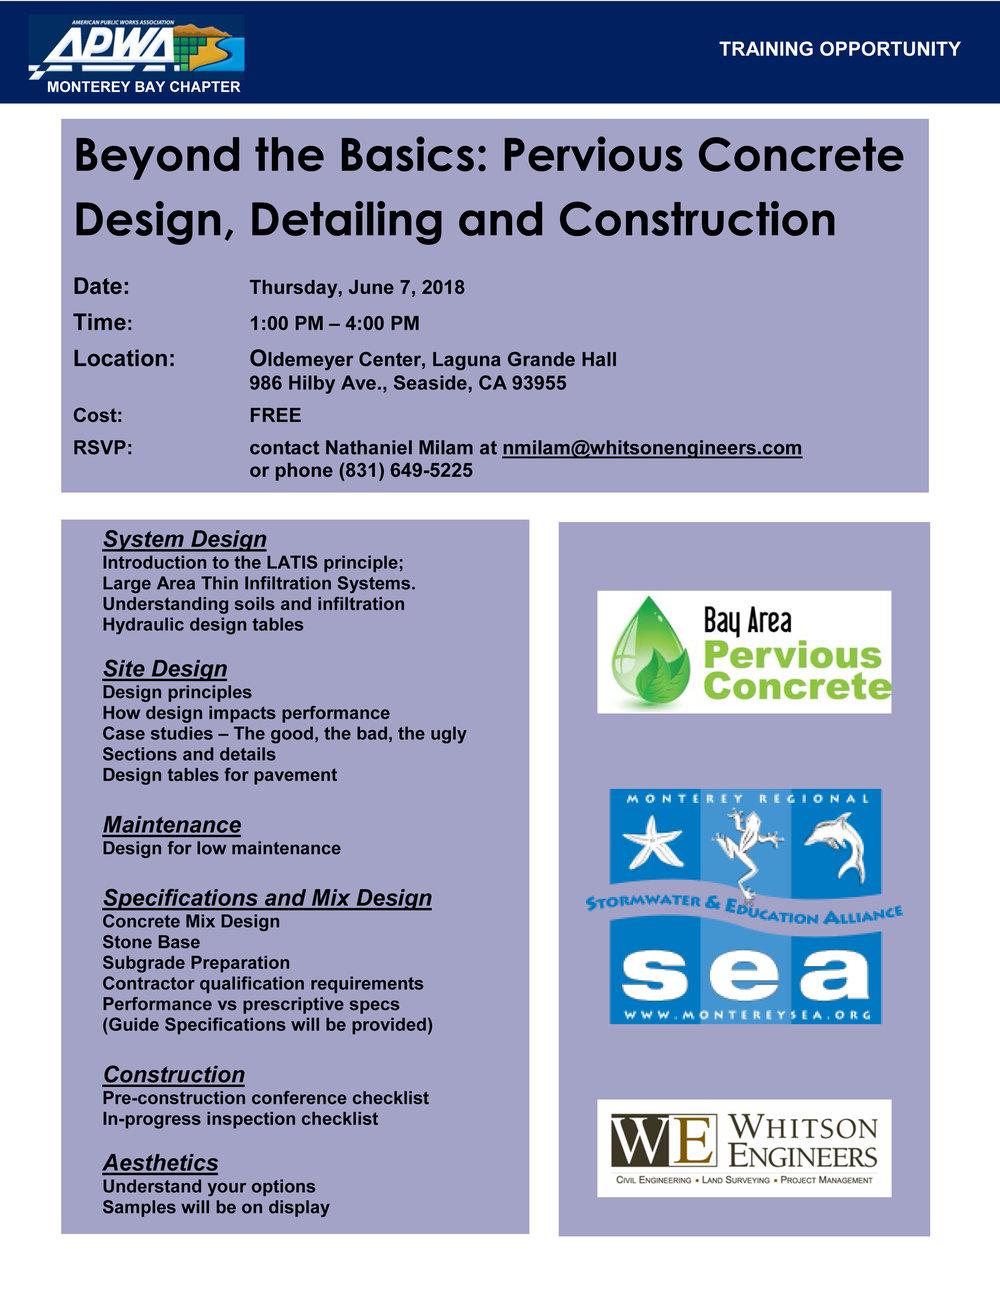 BAPC-APWA-Monterey-Pervious Concrete Workshop-Flyer 6-7-18.jpg